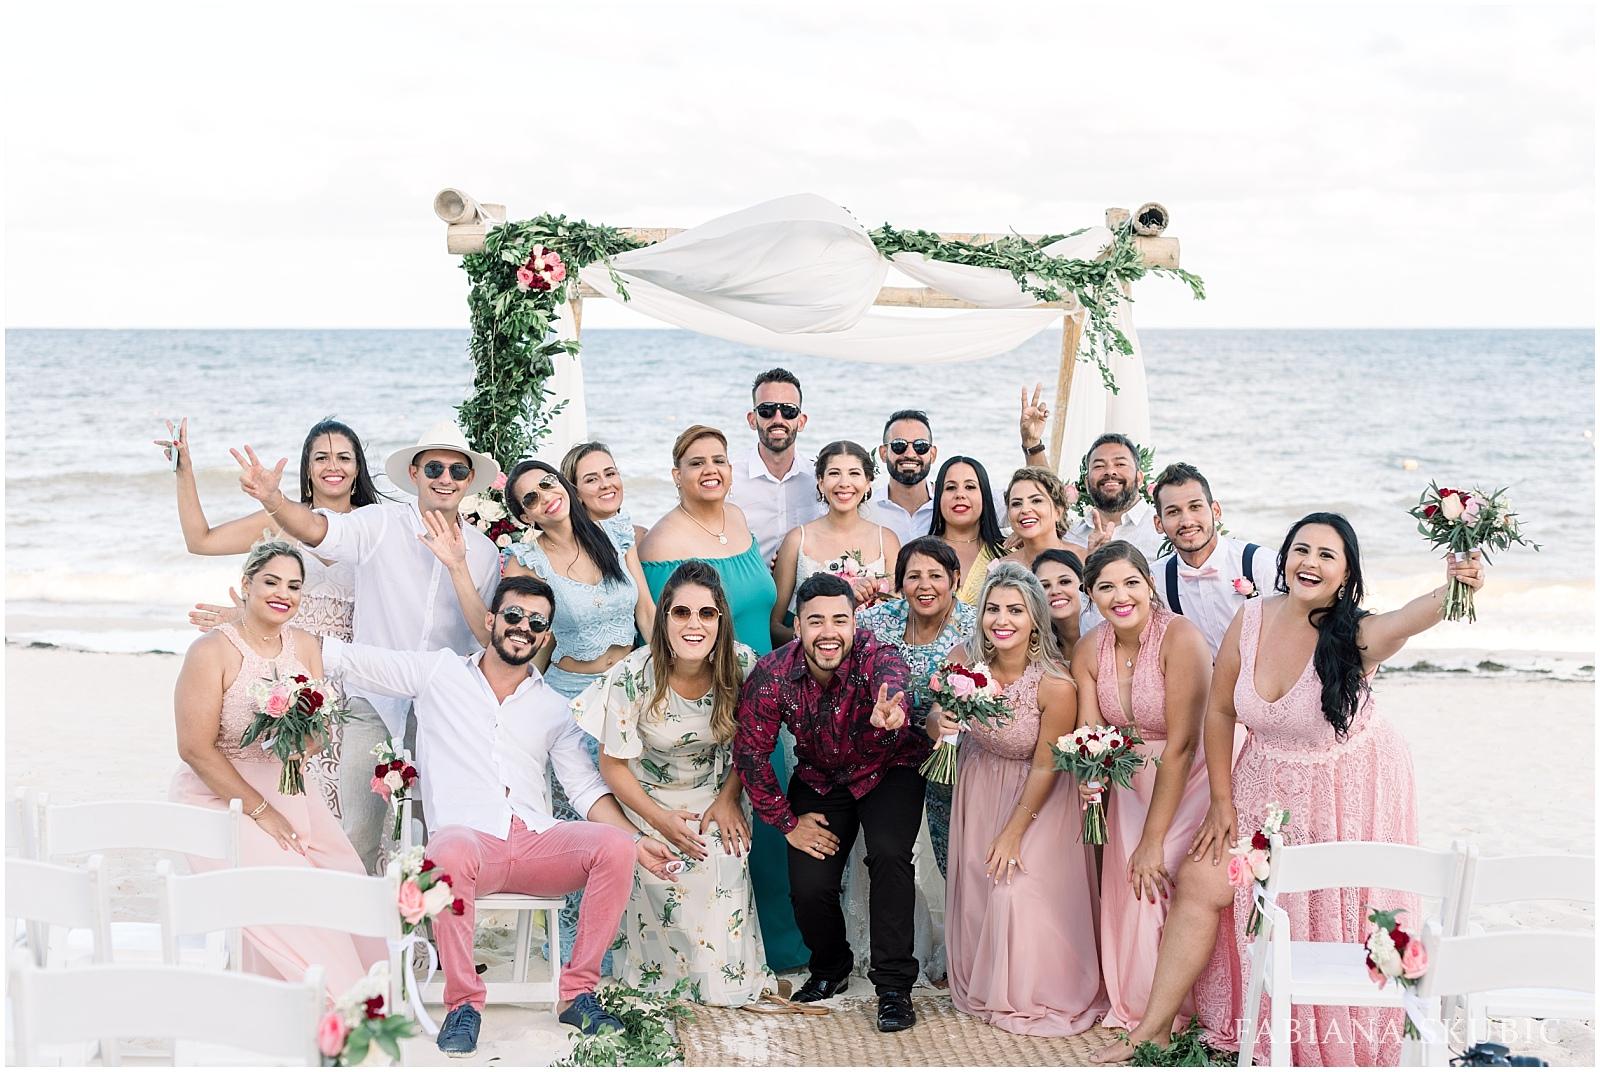 TJ_Now_Sapphire_Riviera_Cancun_Mexico_Wedding_Photos_0247.jpg